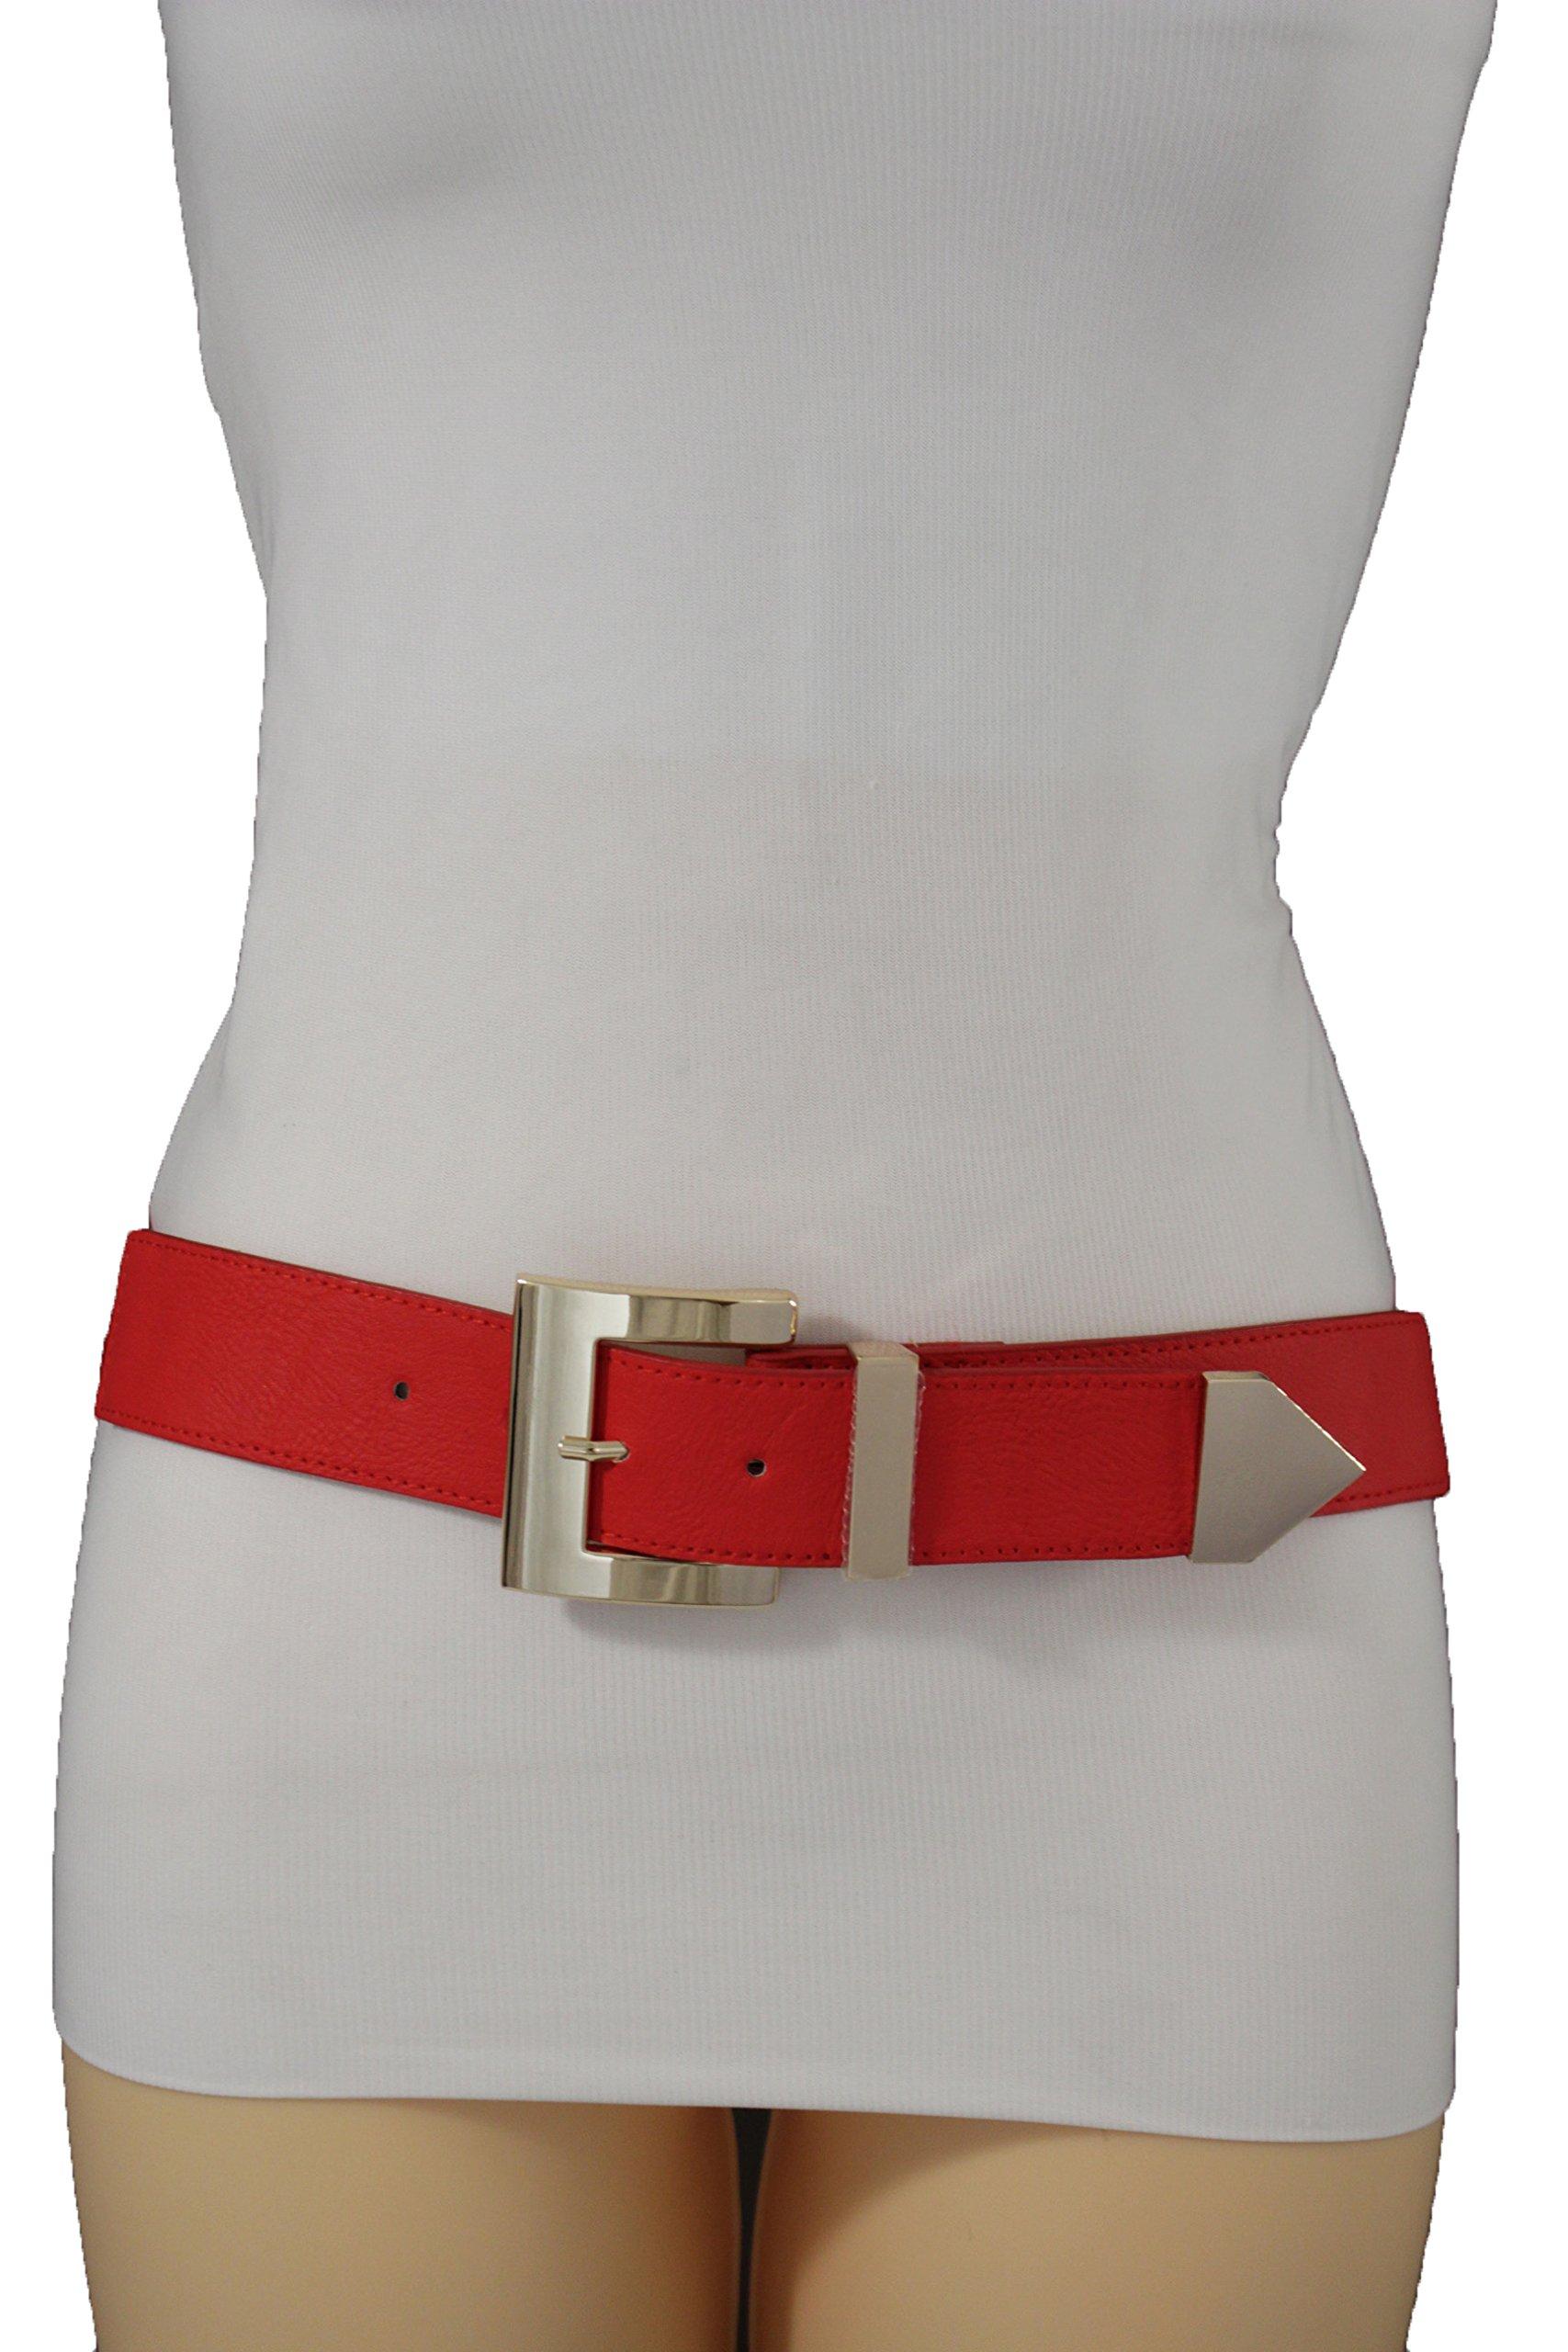 TFJ Women Elastic Belt Hip Waist Gold Sqaure Buckle Elastic Plus M L XL Red